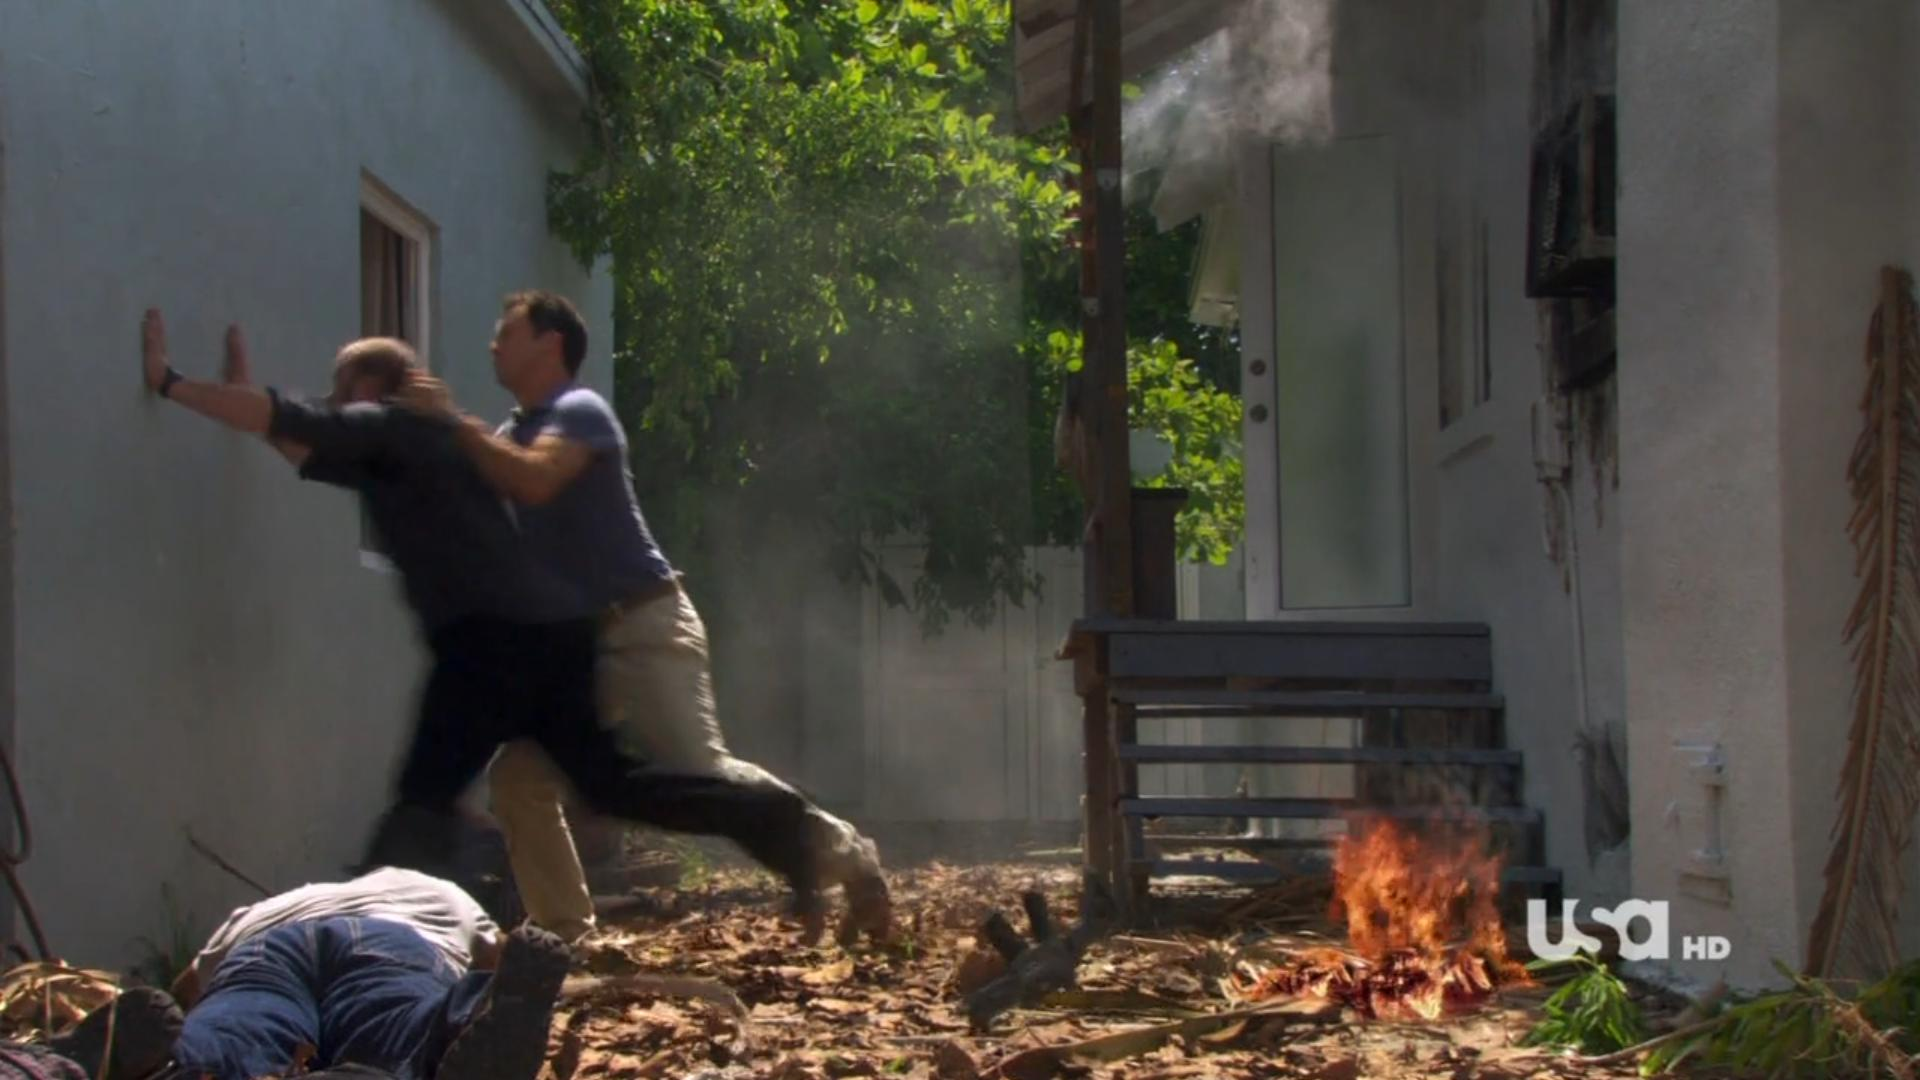 burn notice season 4 episode 9 cucirca